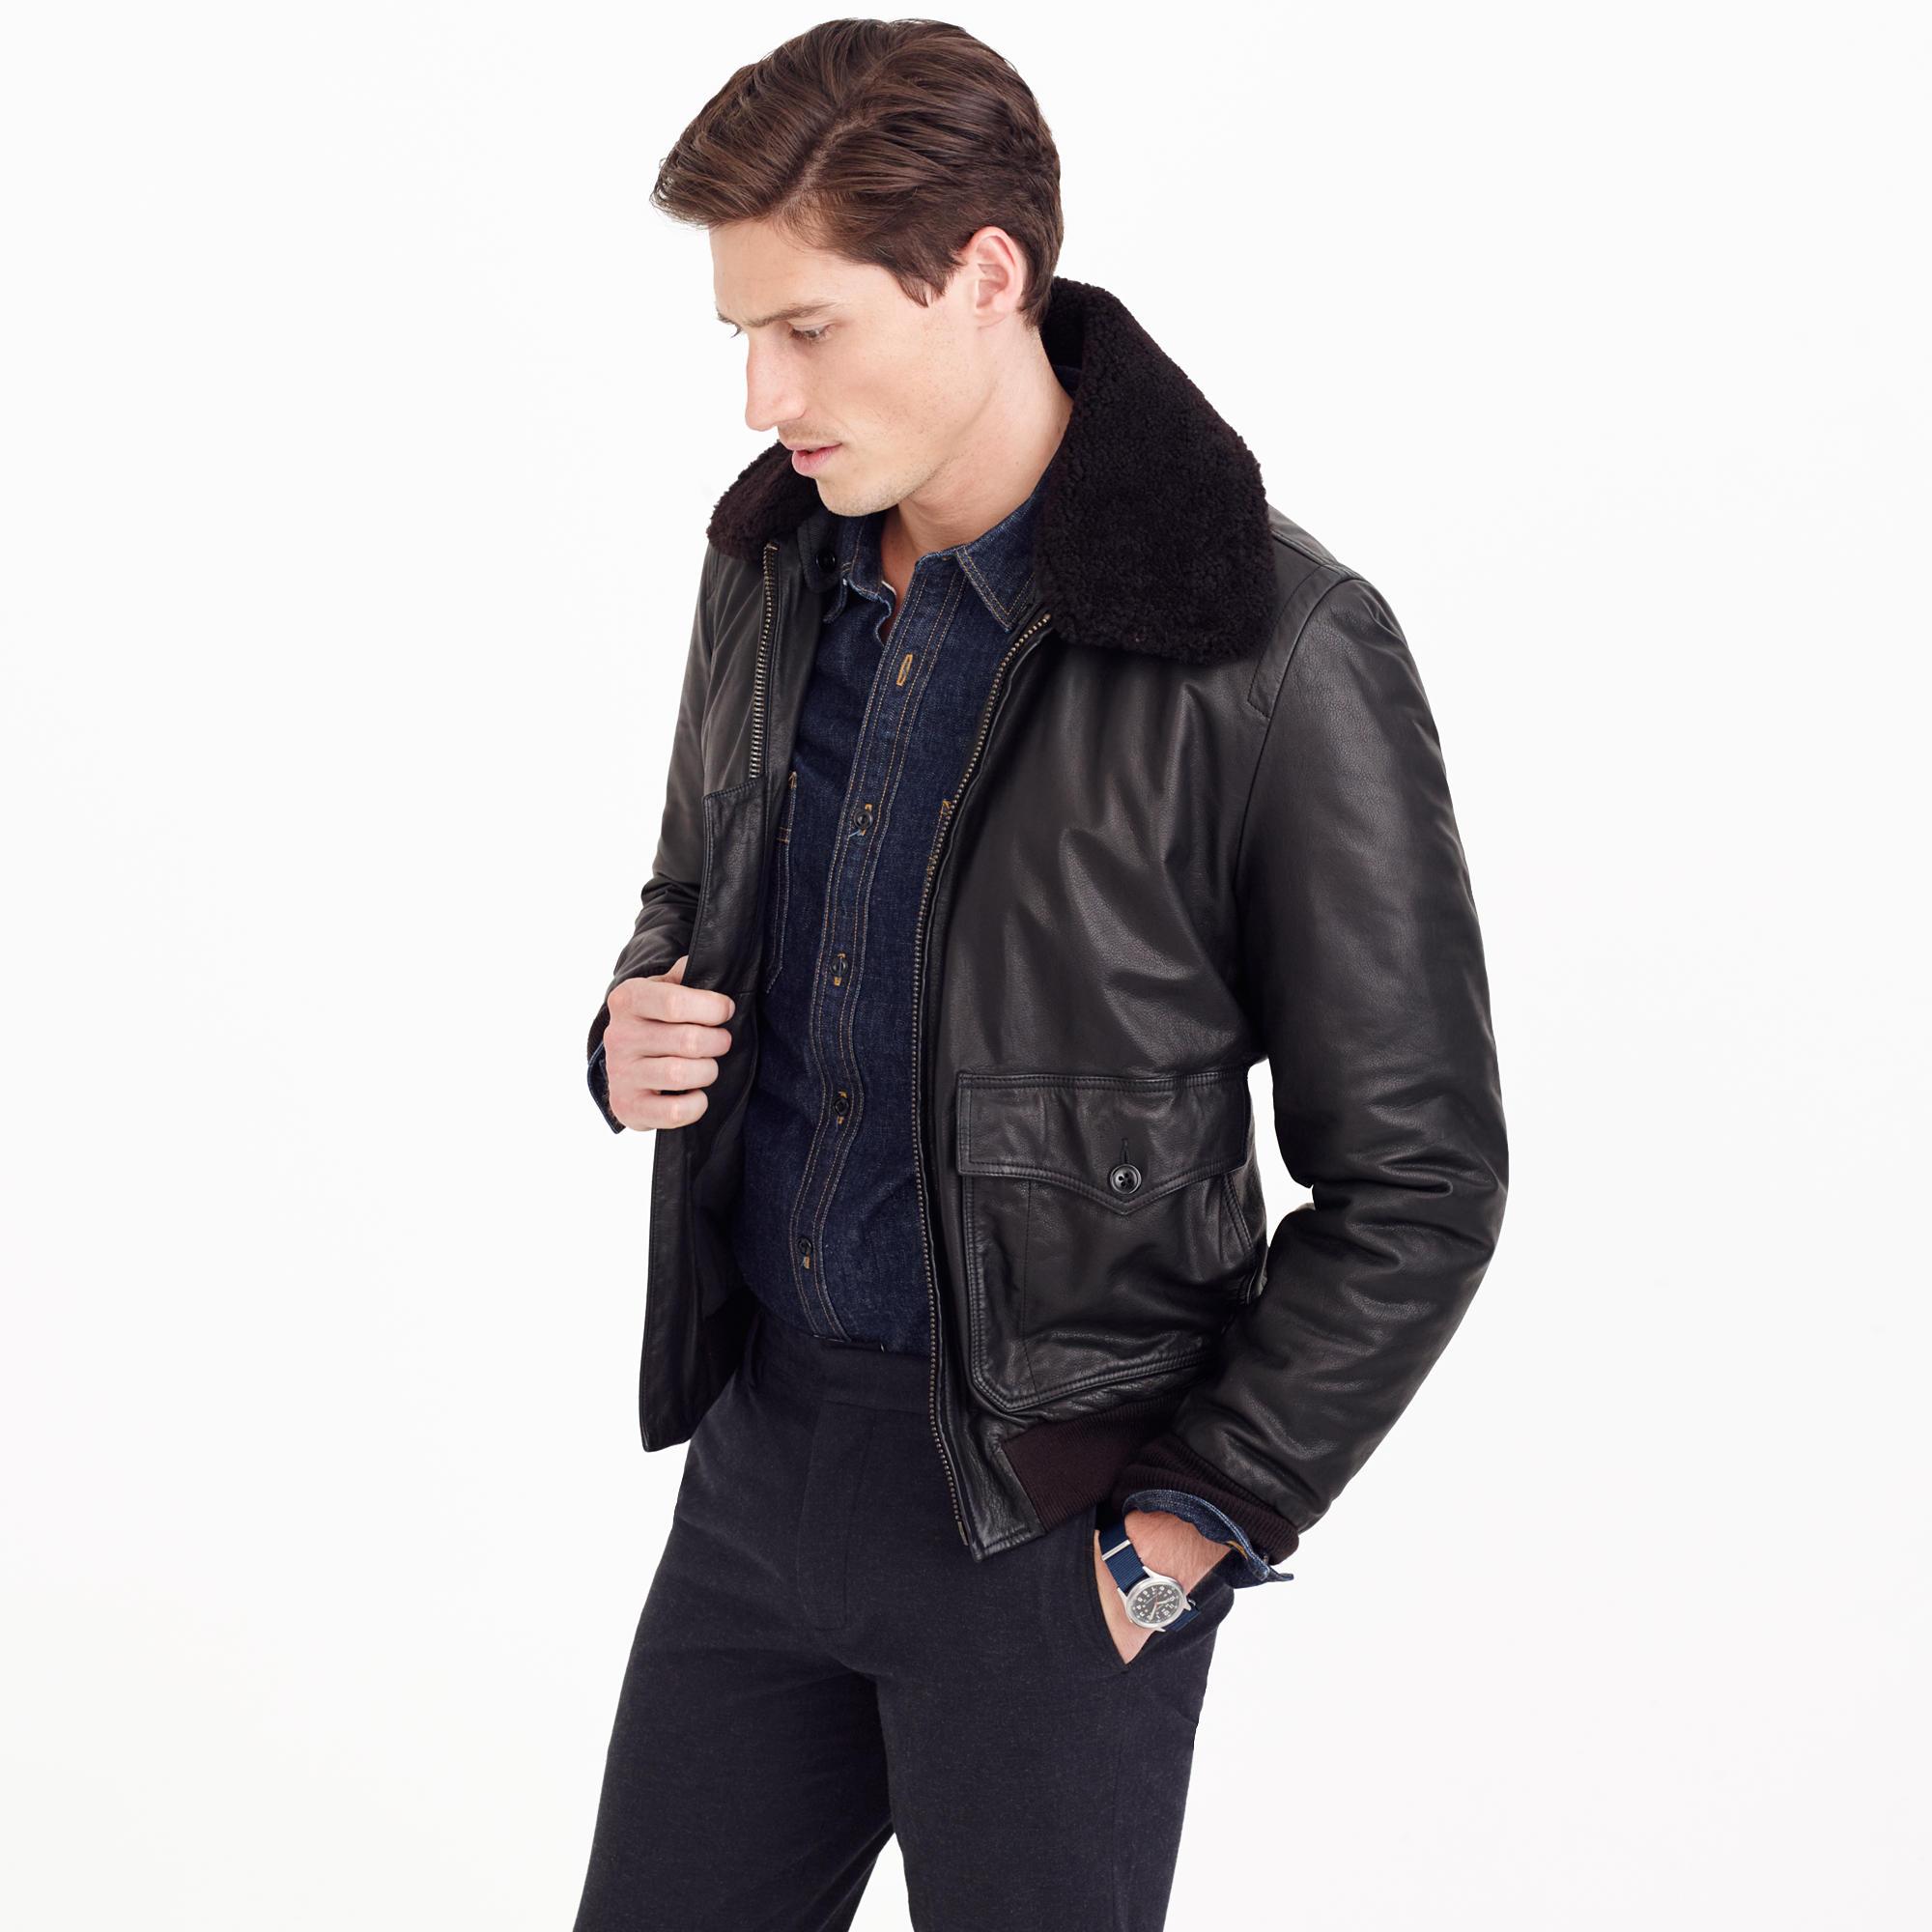 Men's jacket collar - Wallace Amp Barnes Sherpa Collar Italian Leather G 1 Flight